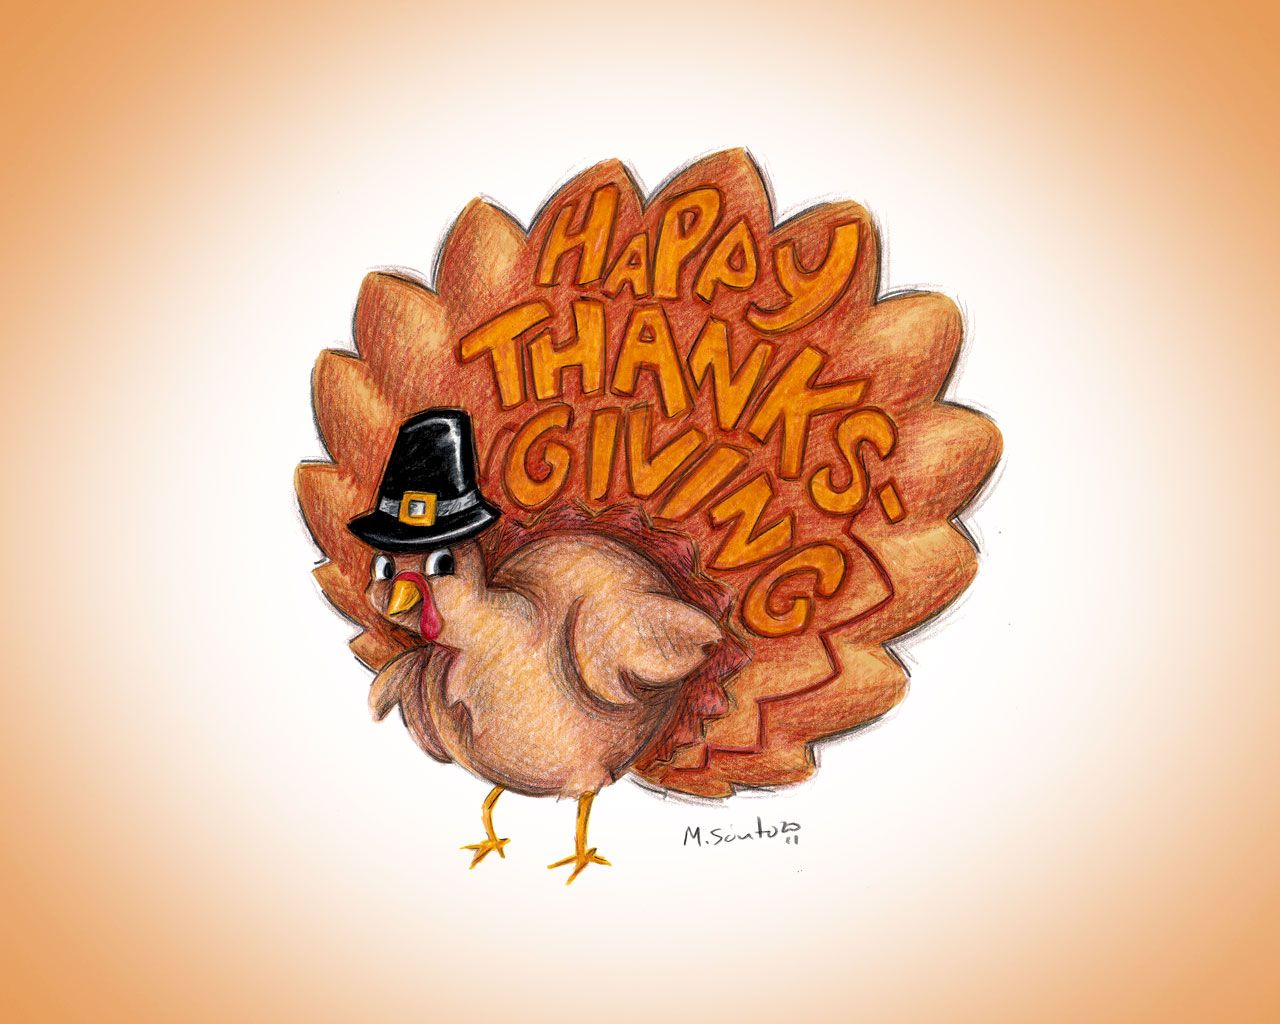 8th annual thanksgiving day - HD1280×1024